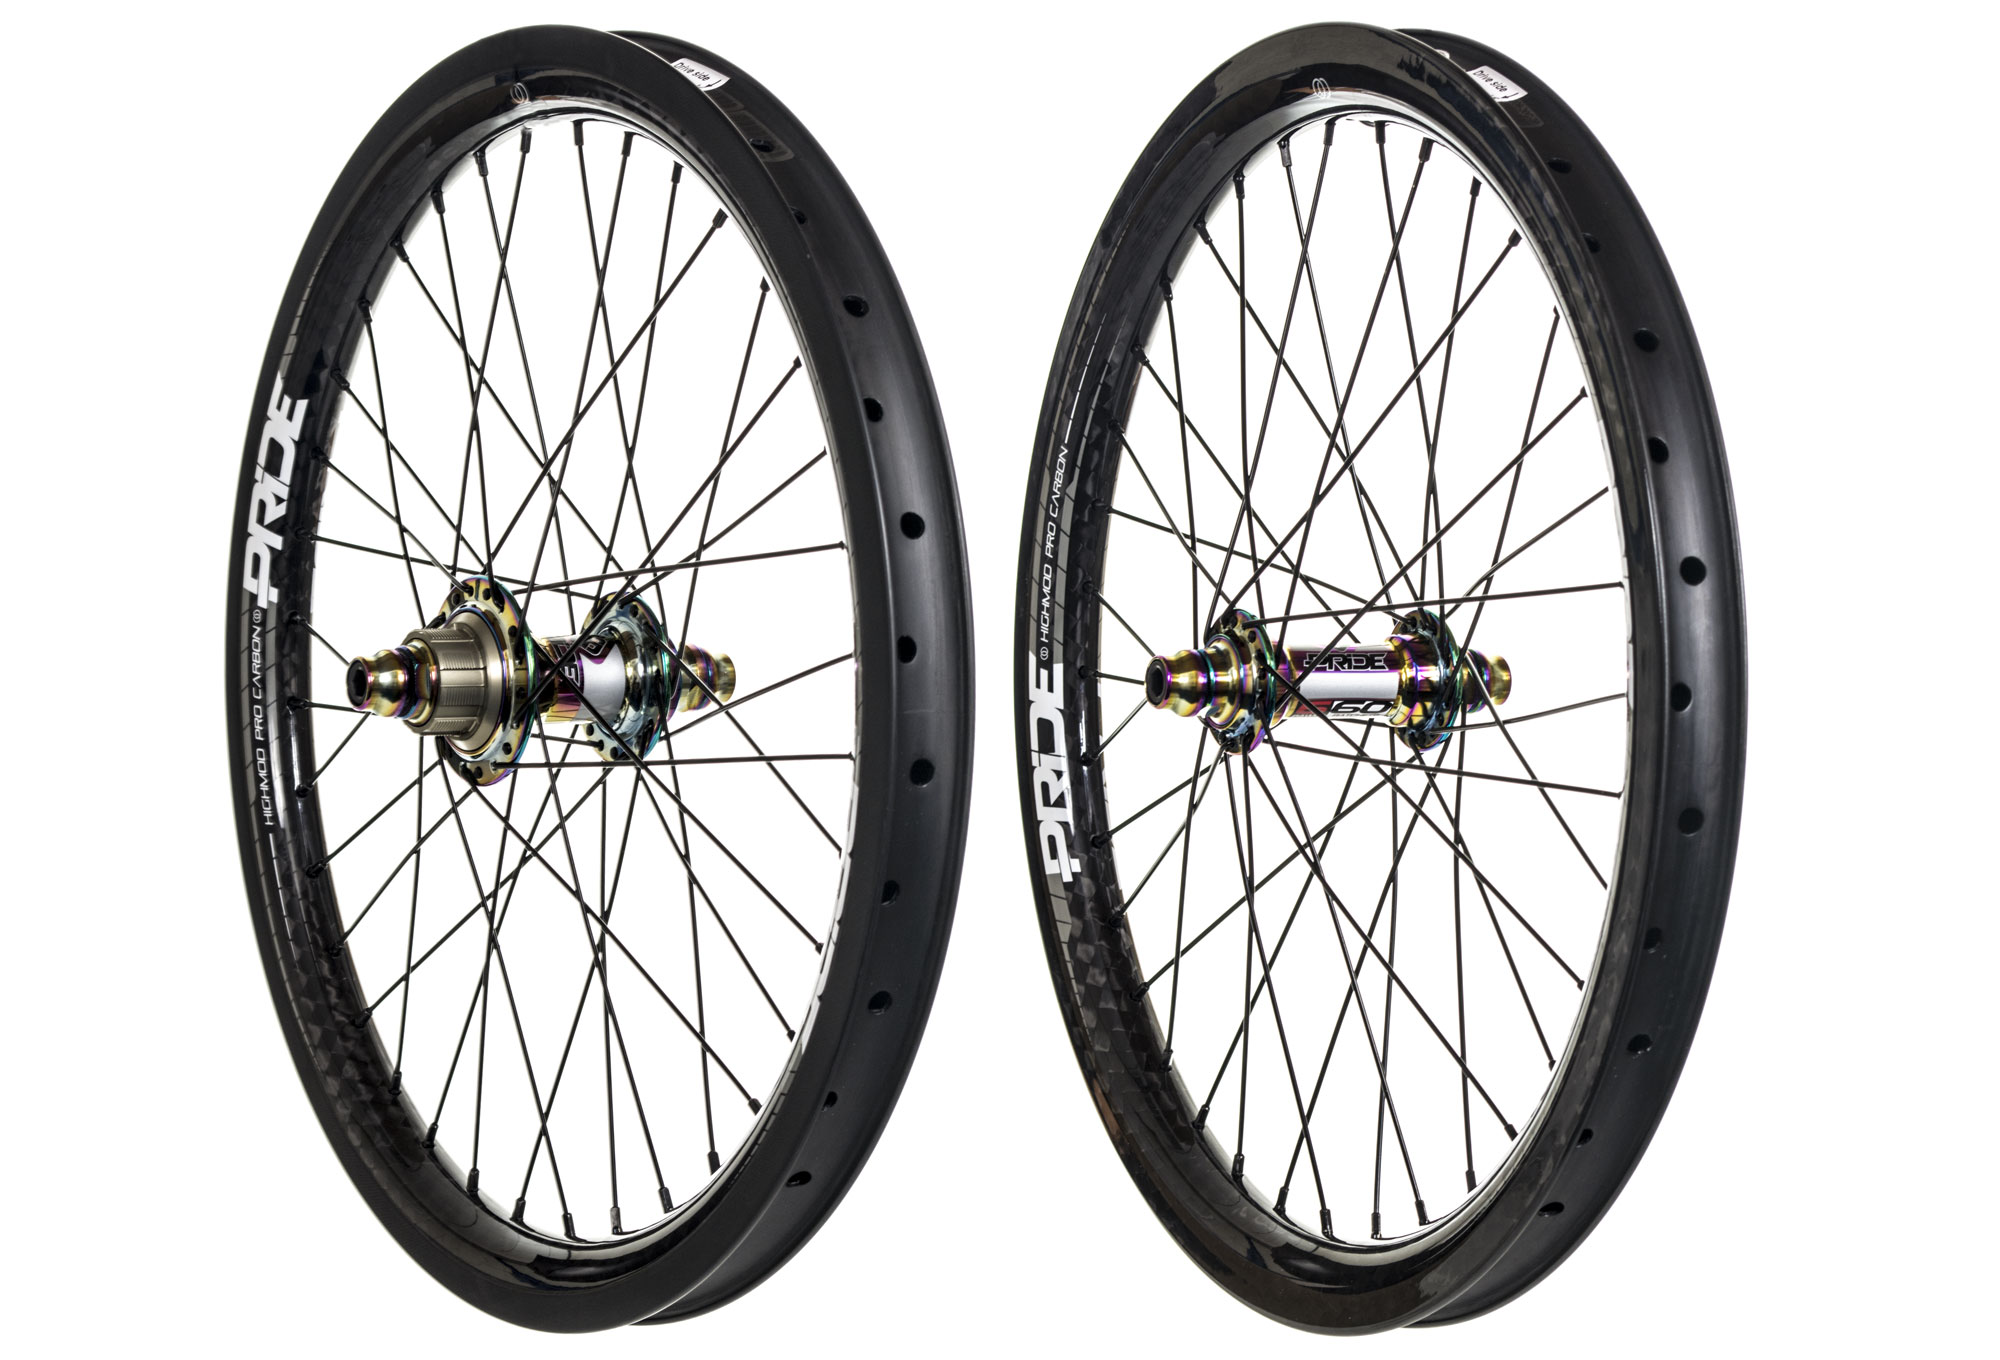 roue bmx race 1 1/8